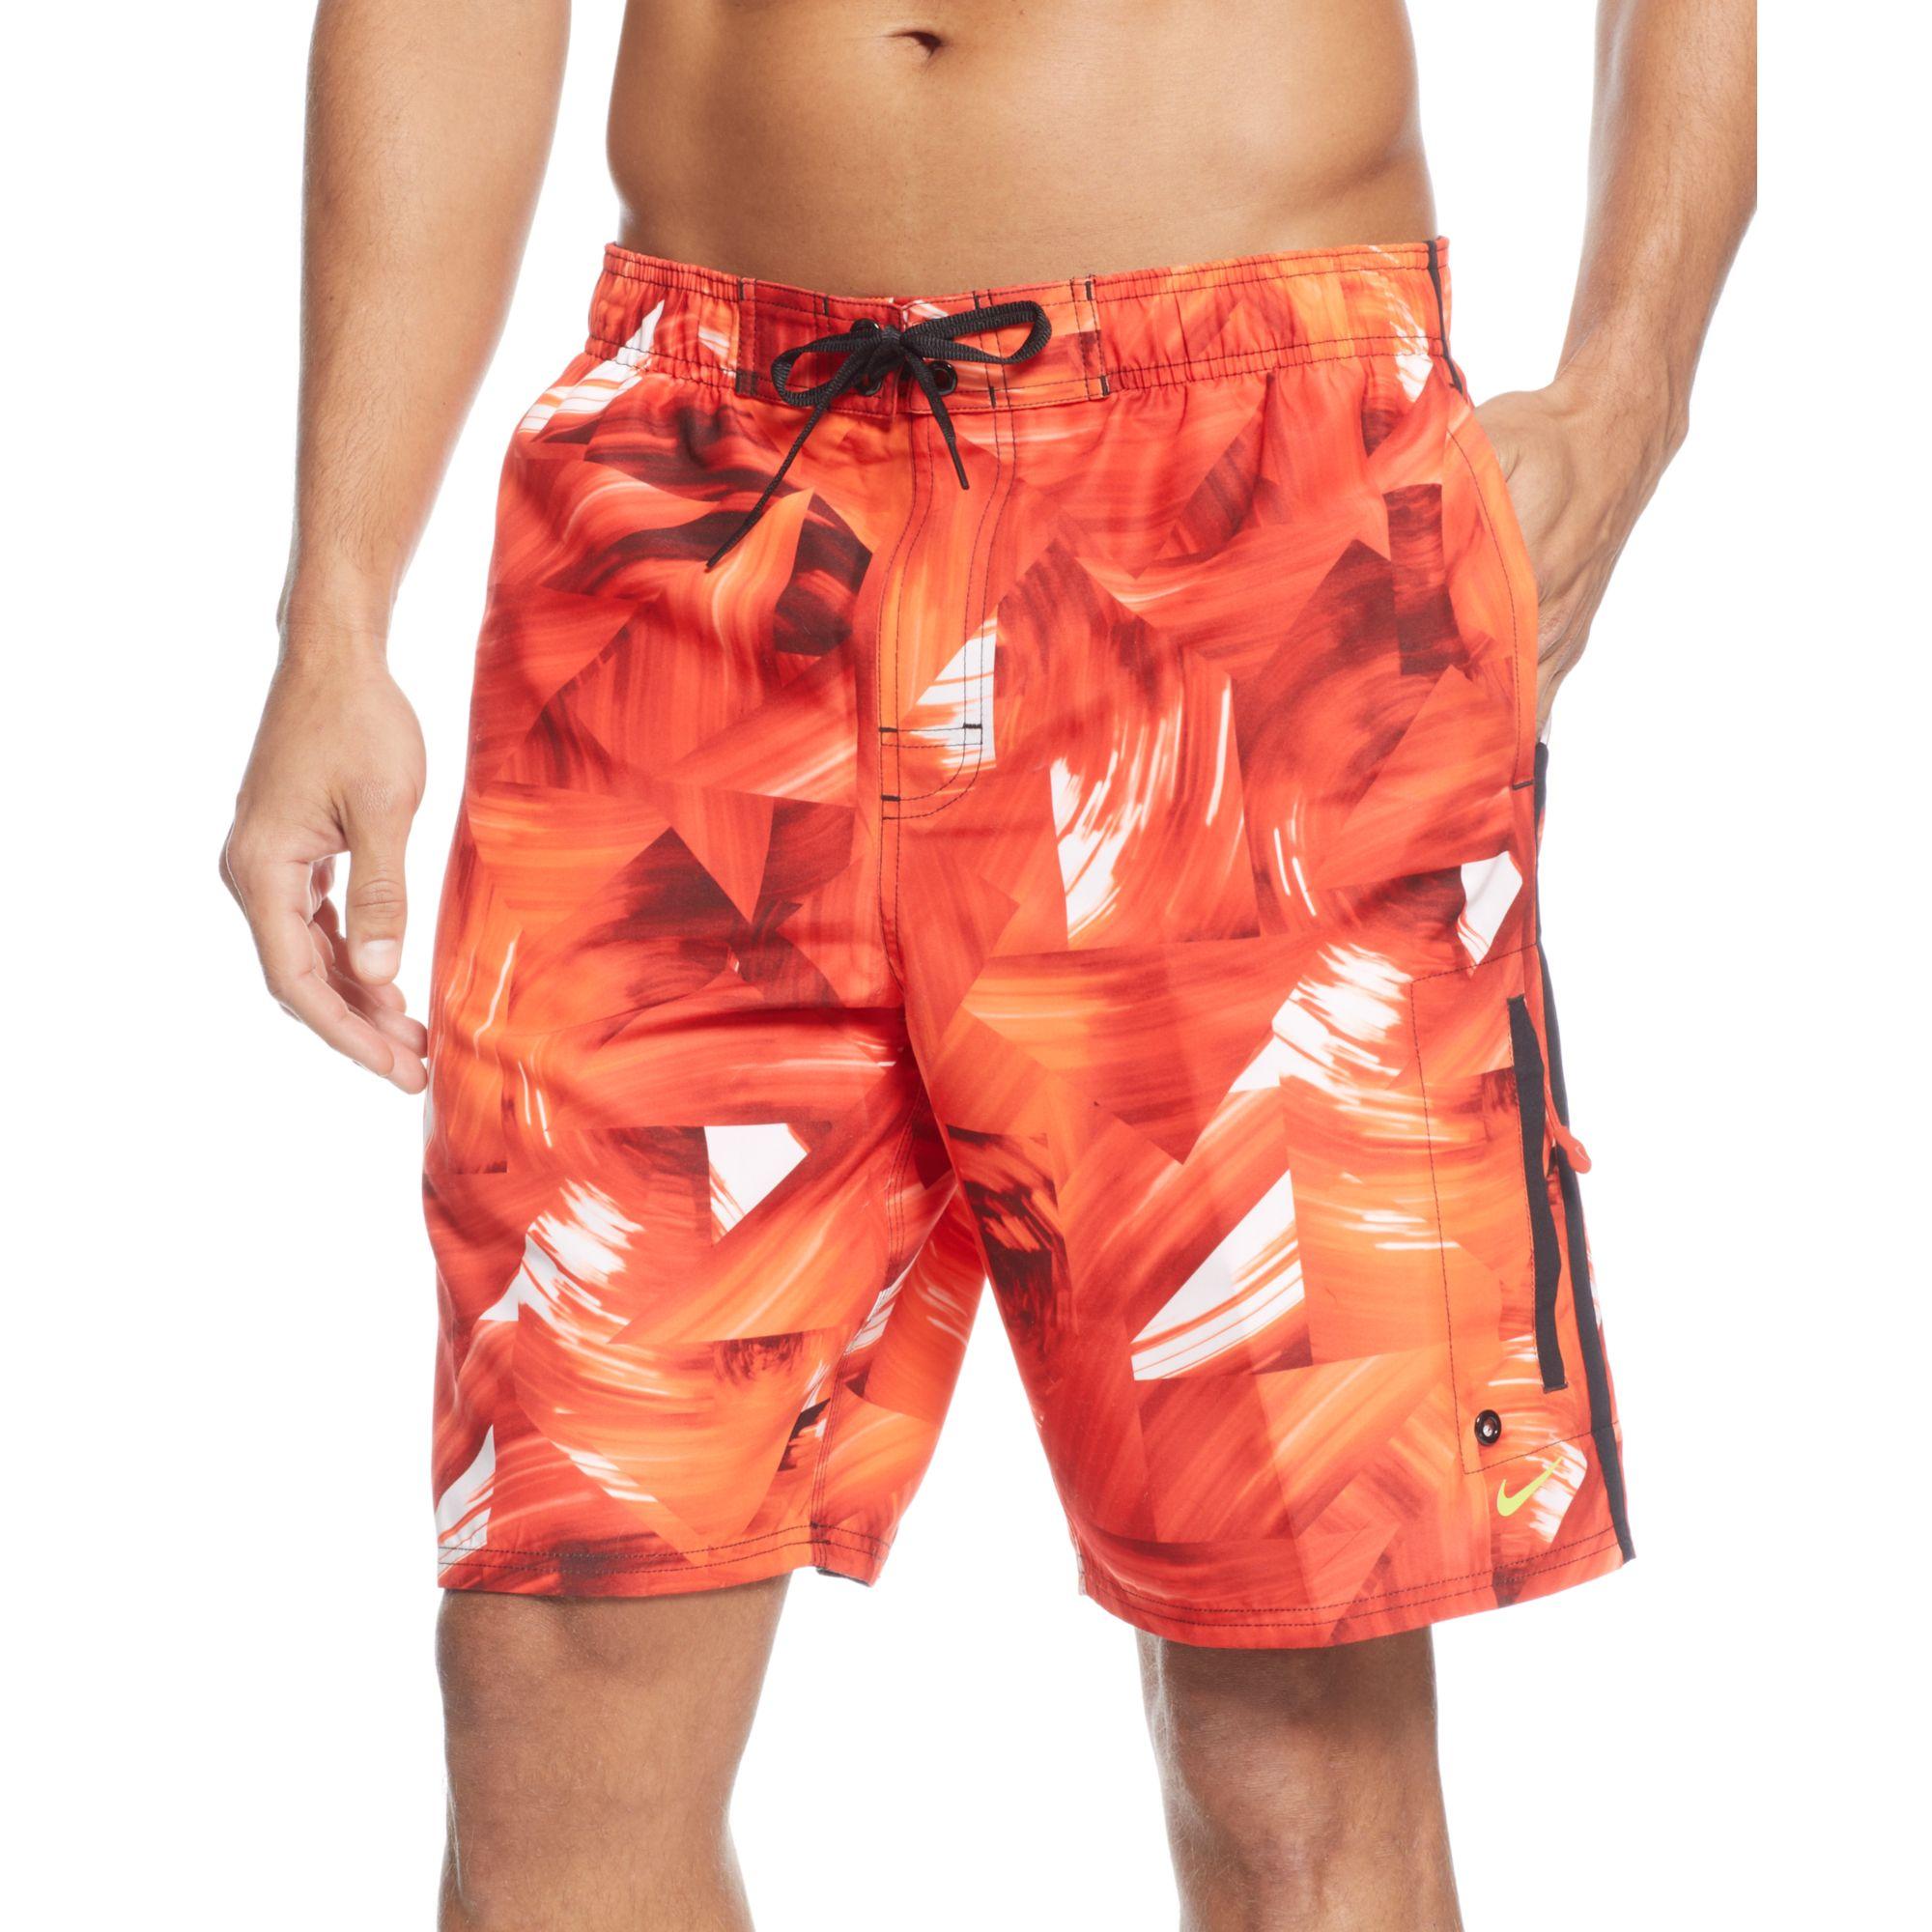 ab7ceb0b9f Lyst - Nike Vortex 9 Volley Swim Trunks in Red for Men